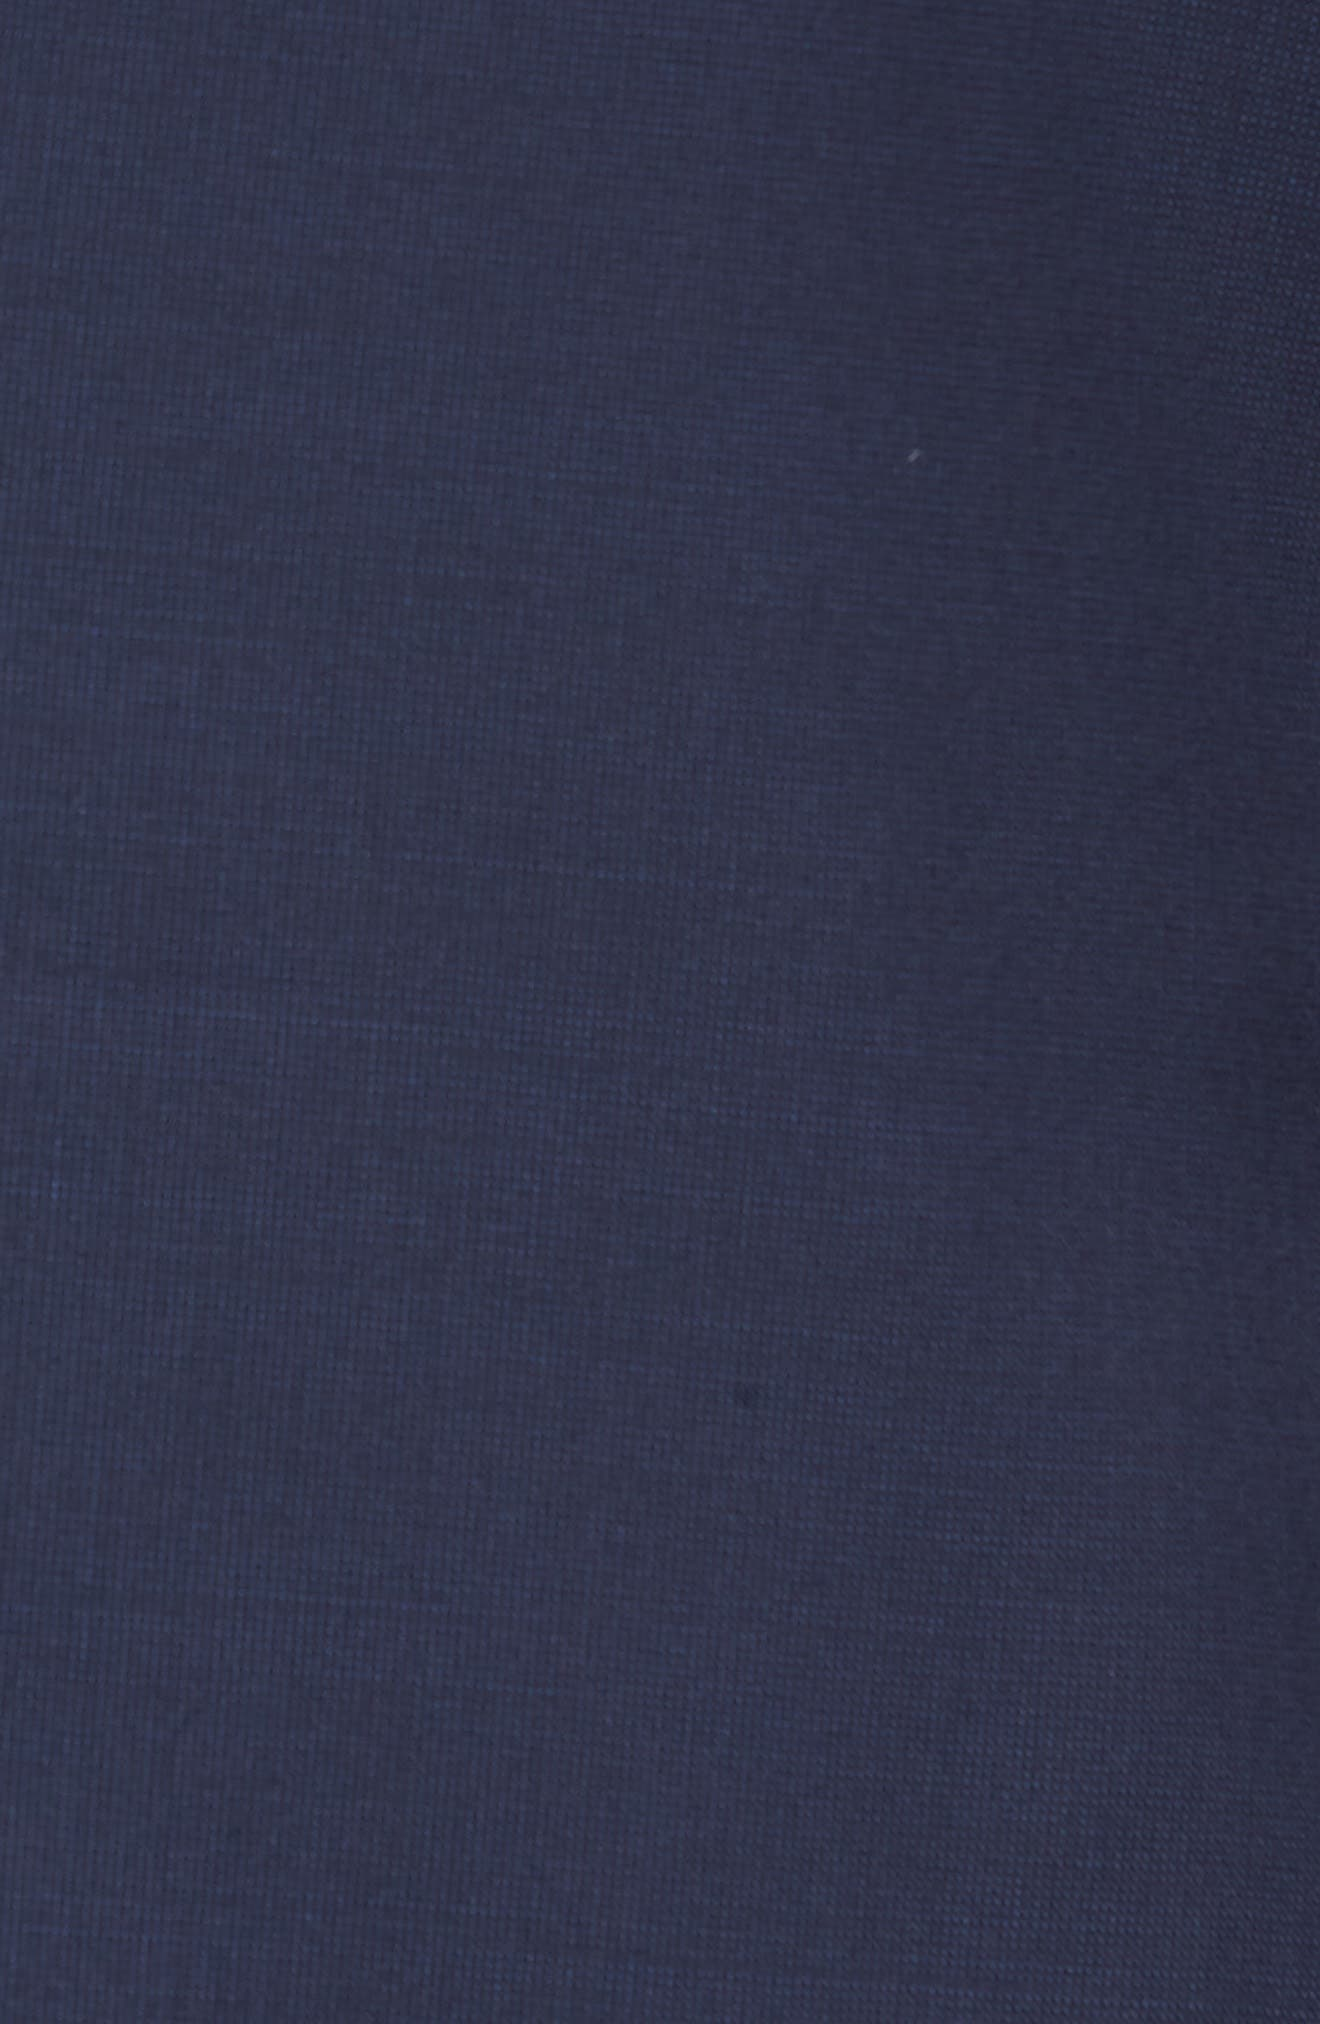 TED BAKER LONDON, Trevi Slim Fit Wool Blazer, Alternate thumbnail 6, color, NAVY